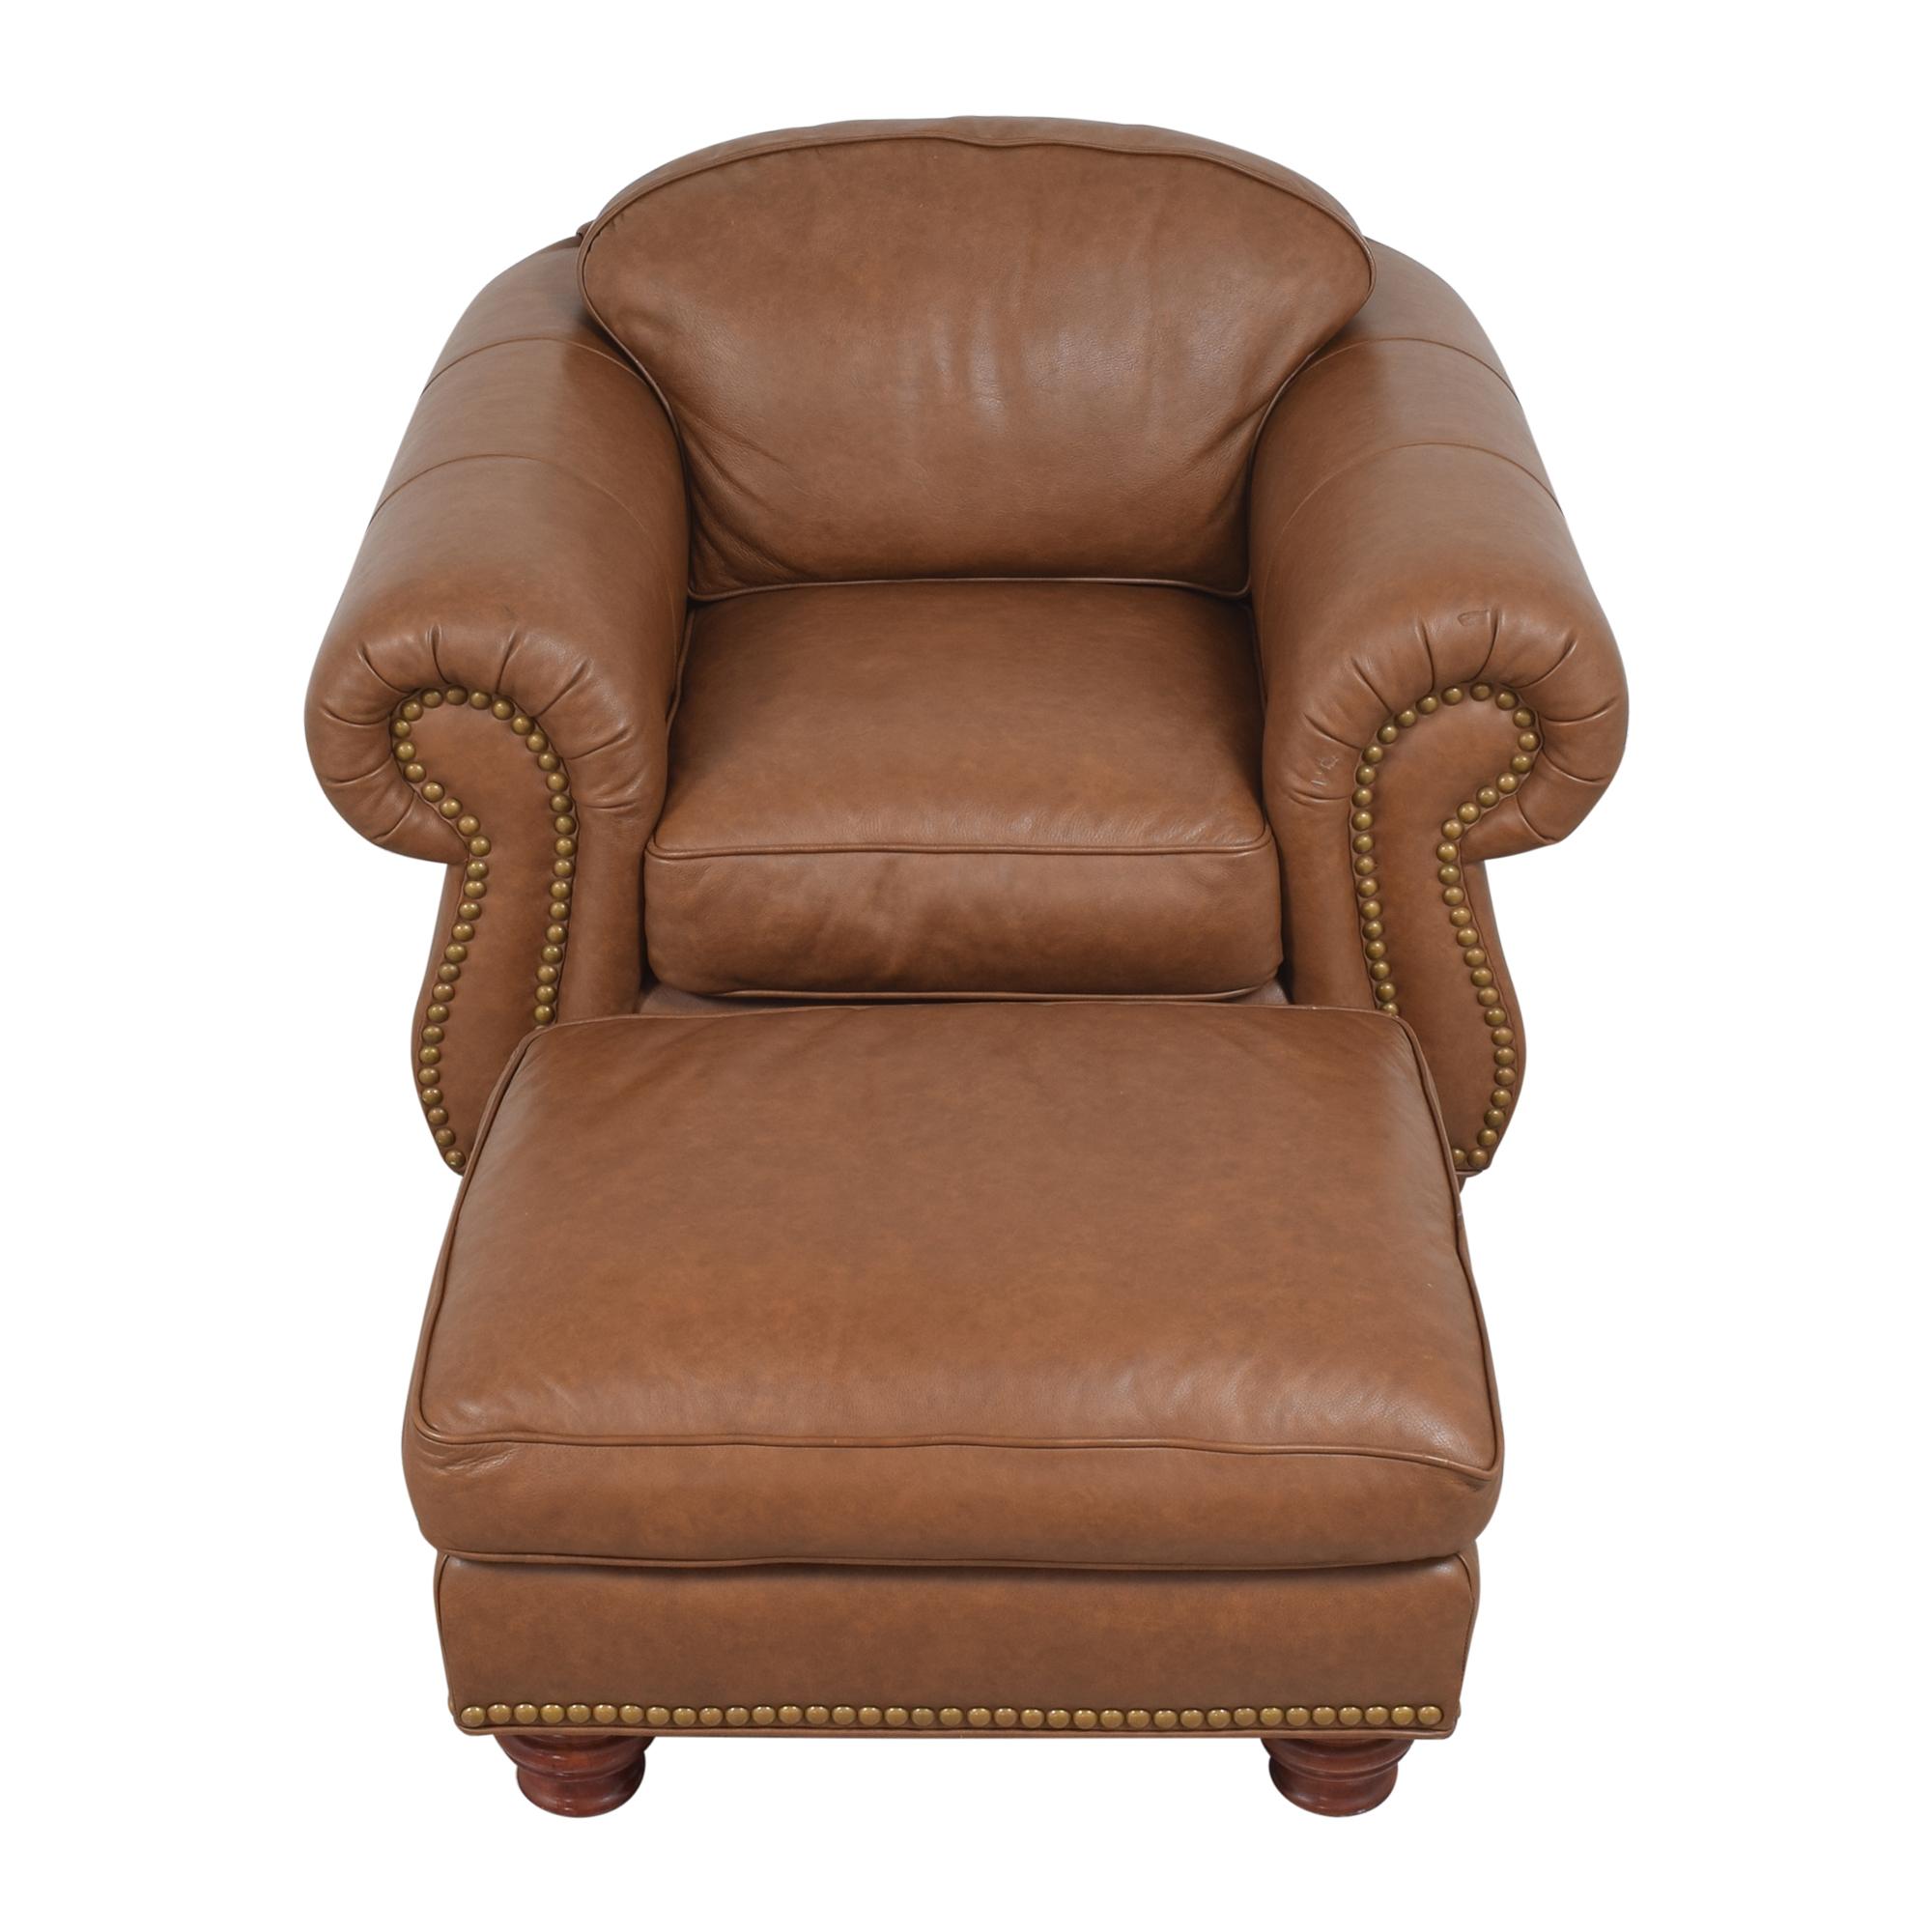 buy Thomasville Nailhead Club Chair with Ottoman Thomasville